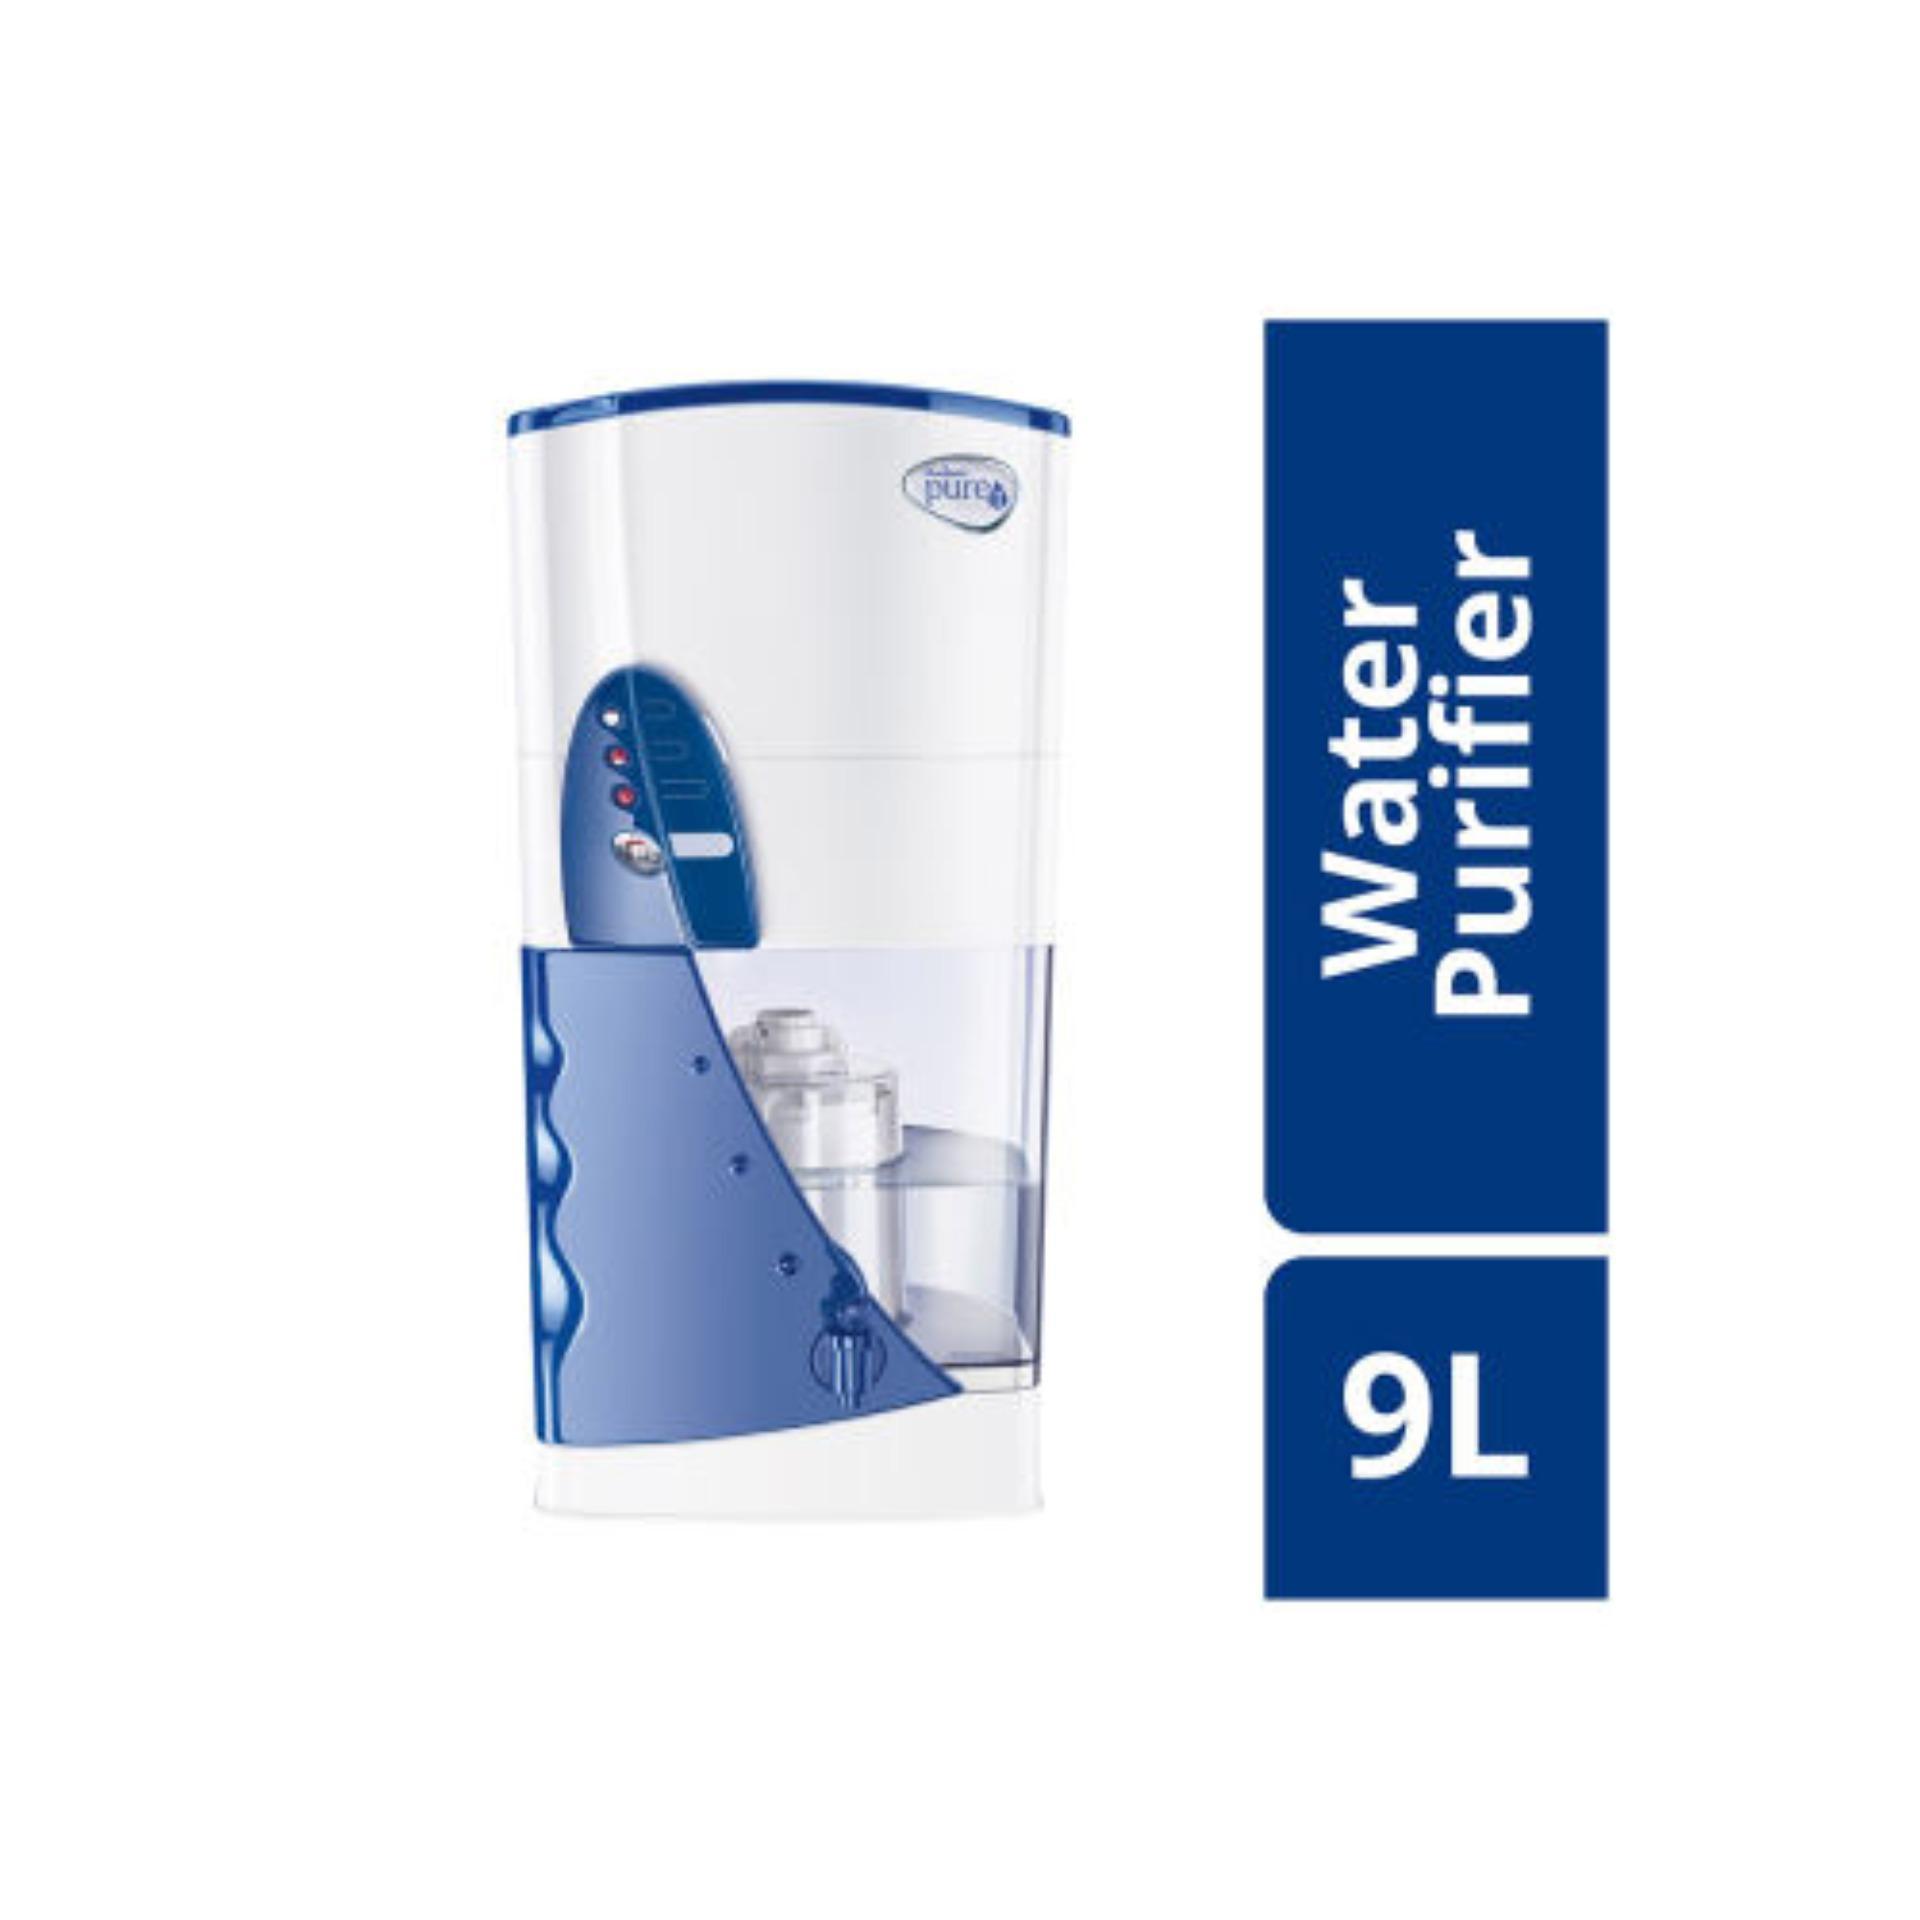 PureIt Water Purifier – Classic9L